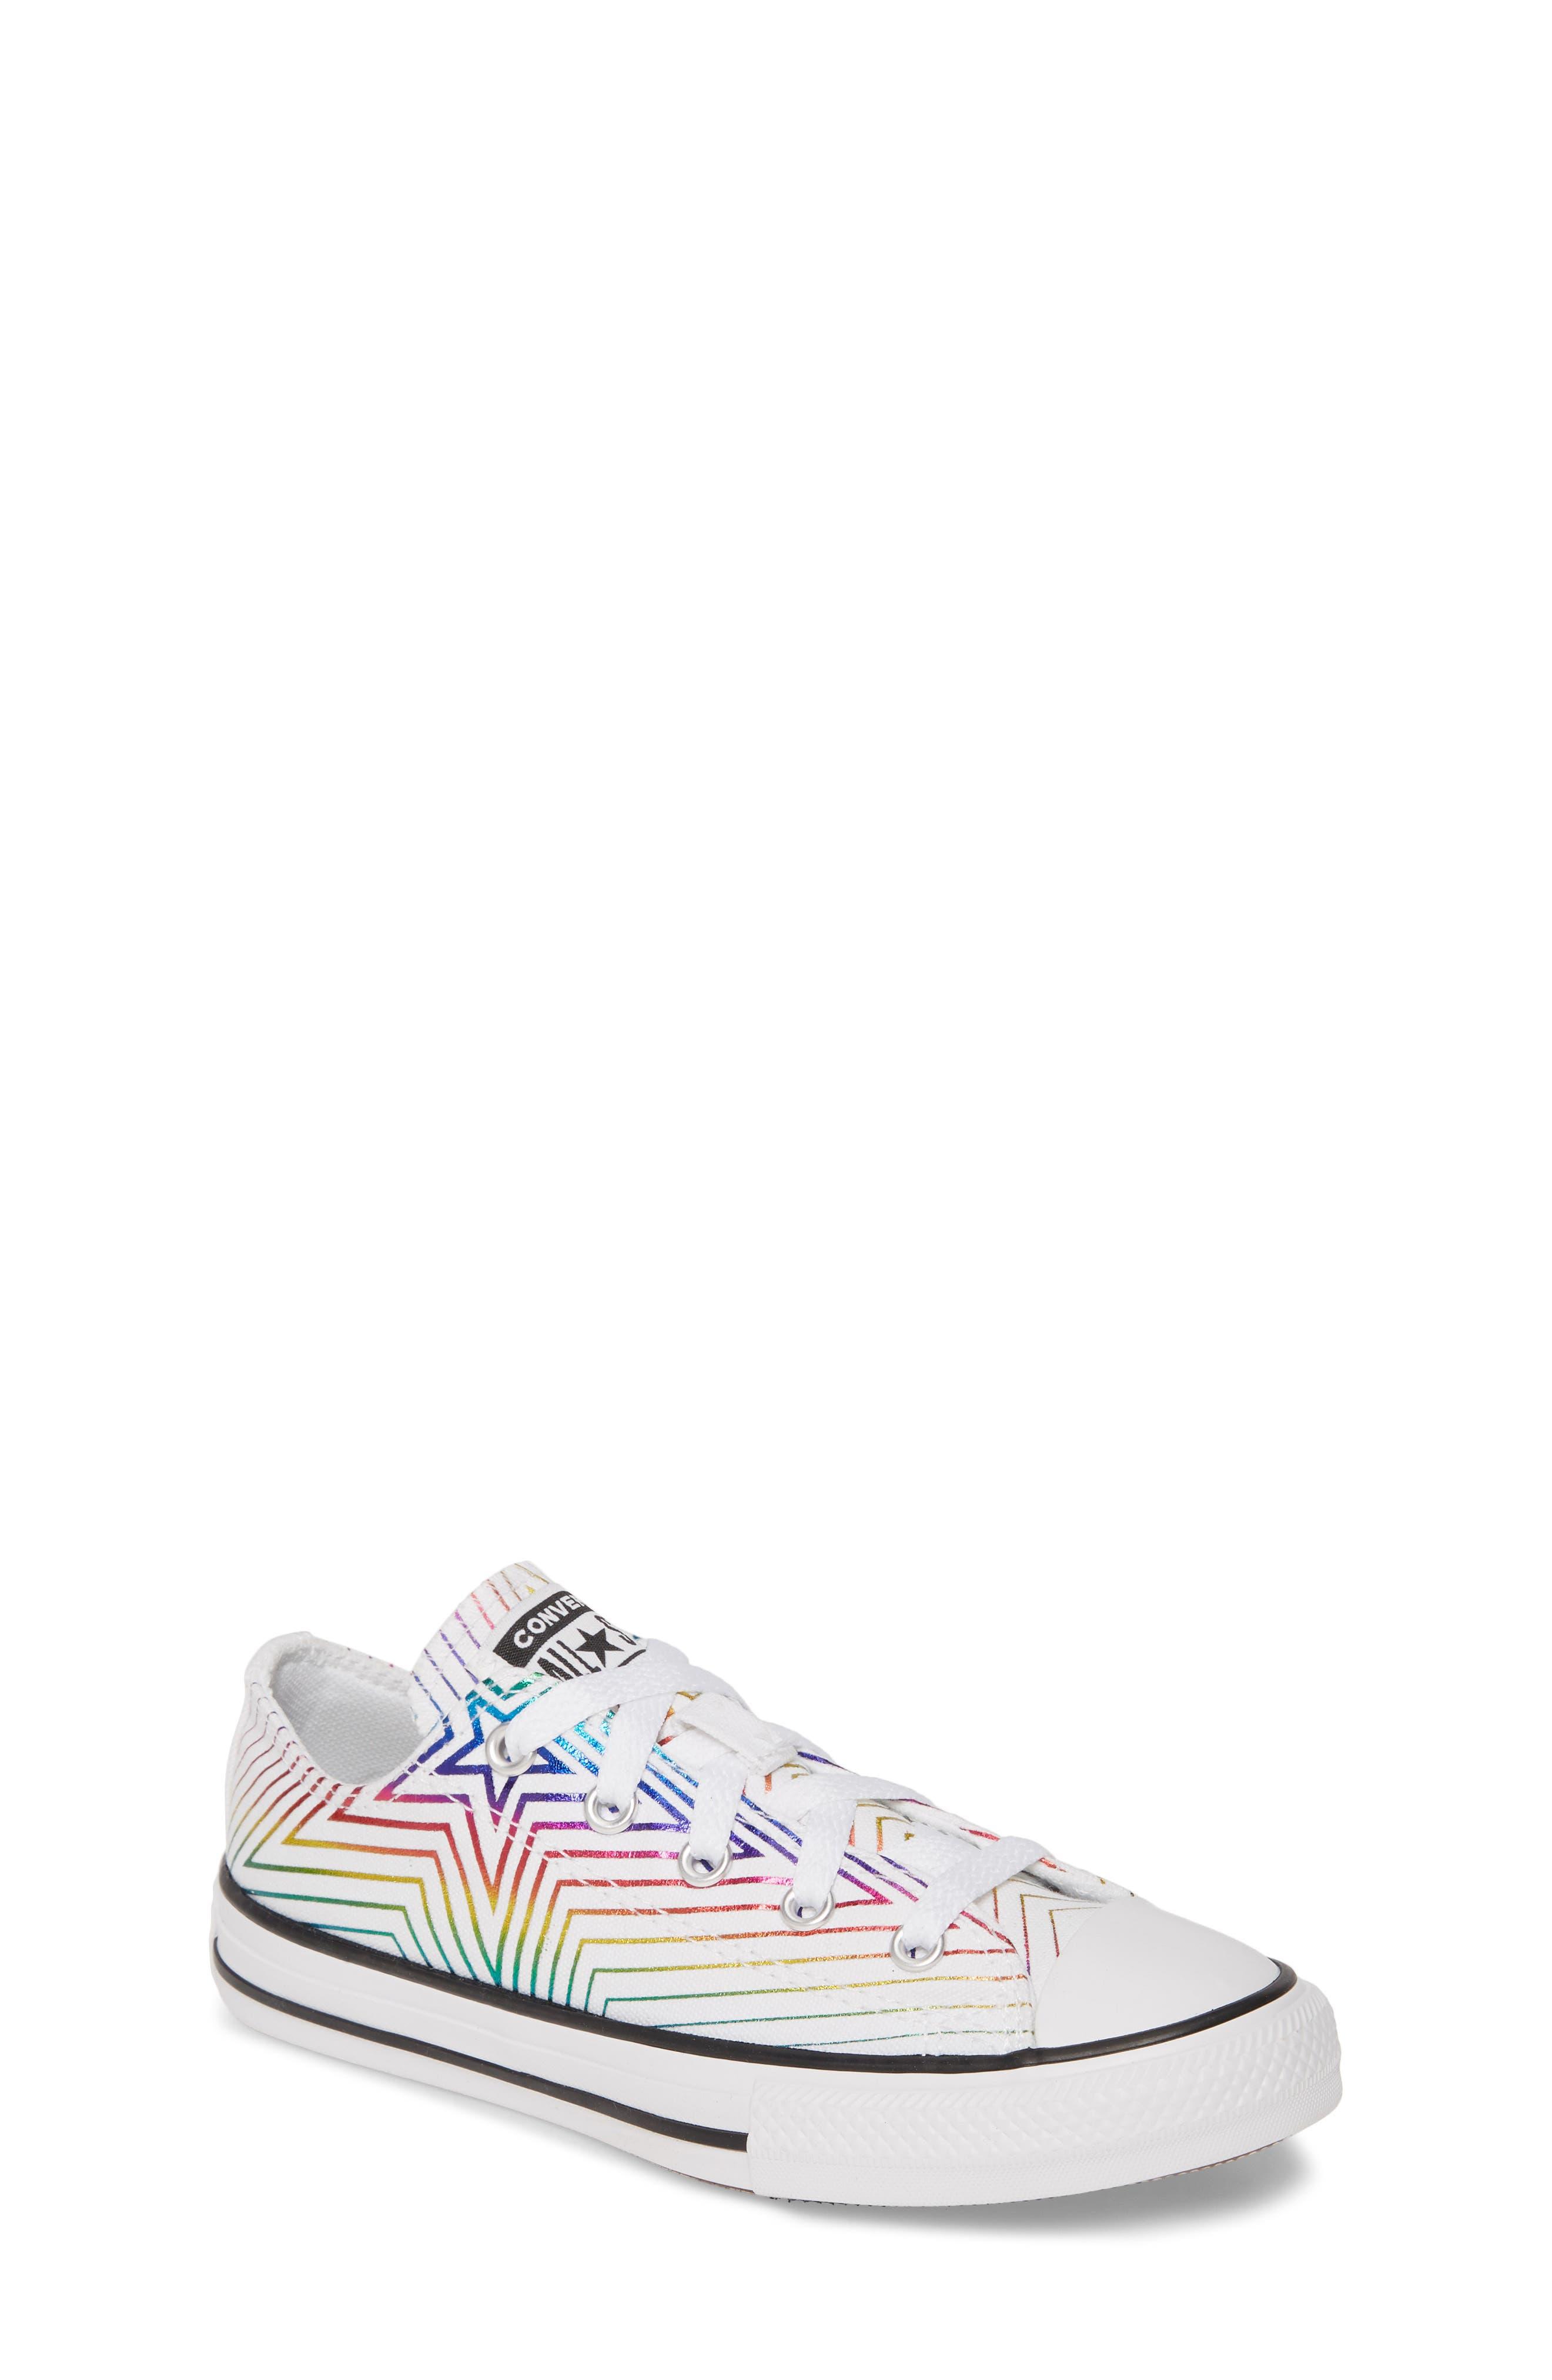 Rainbow Star Low Top Sneaker (Toddler